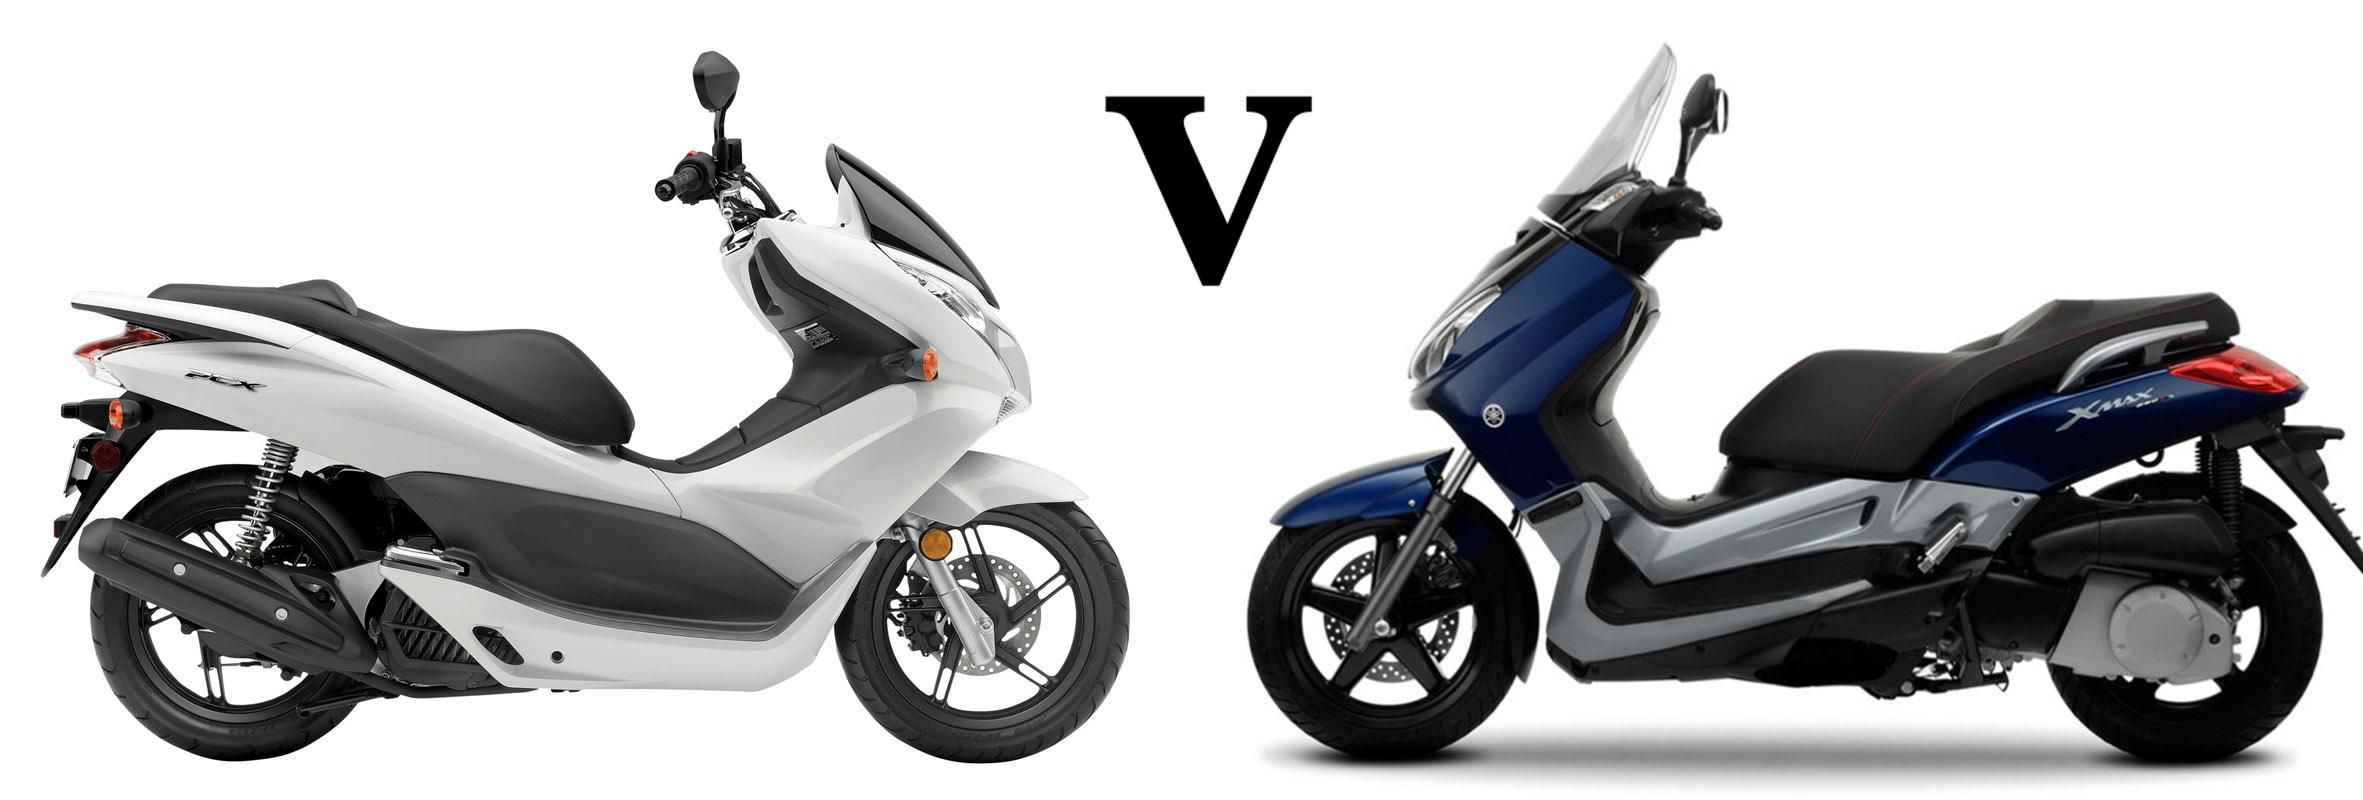 Versus: Honda PCX125 vs Yamaha X-Max 125 | Visordown